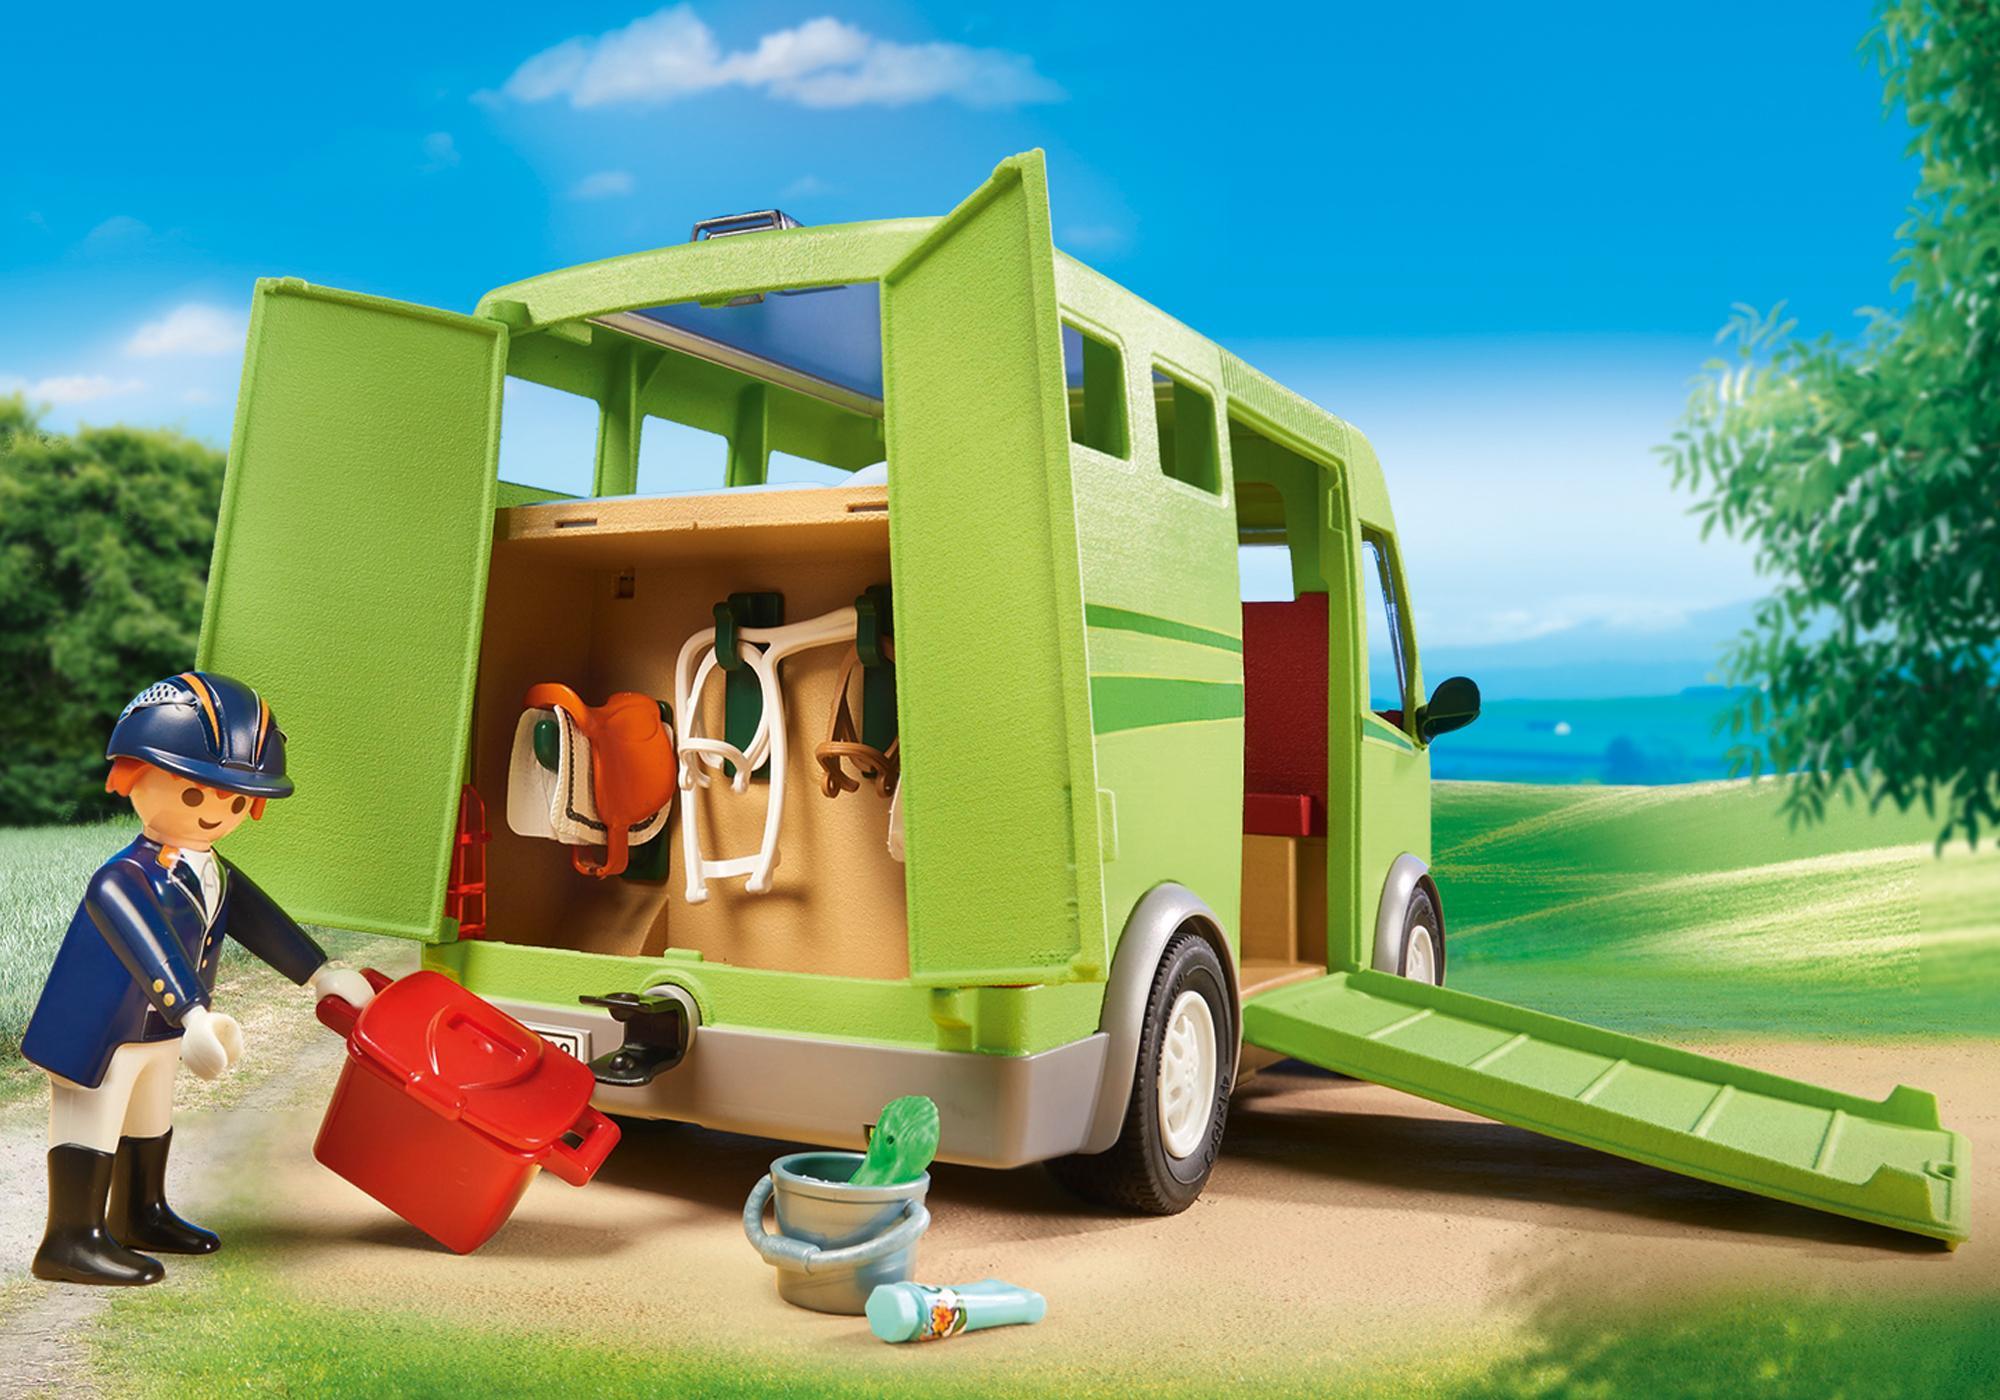 http://media.playmobil.com/i/playmobil/6928_product_extra2/Pferdetransporter